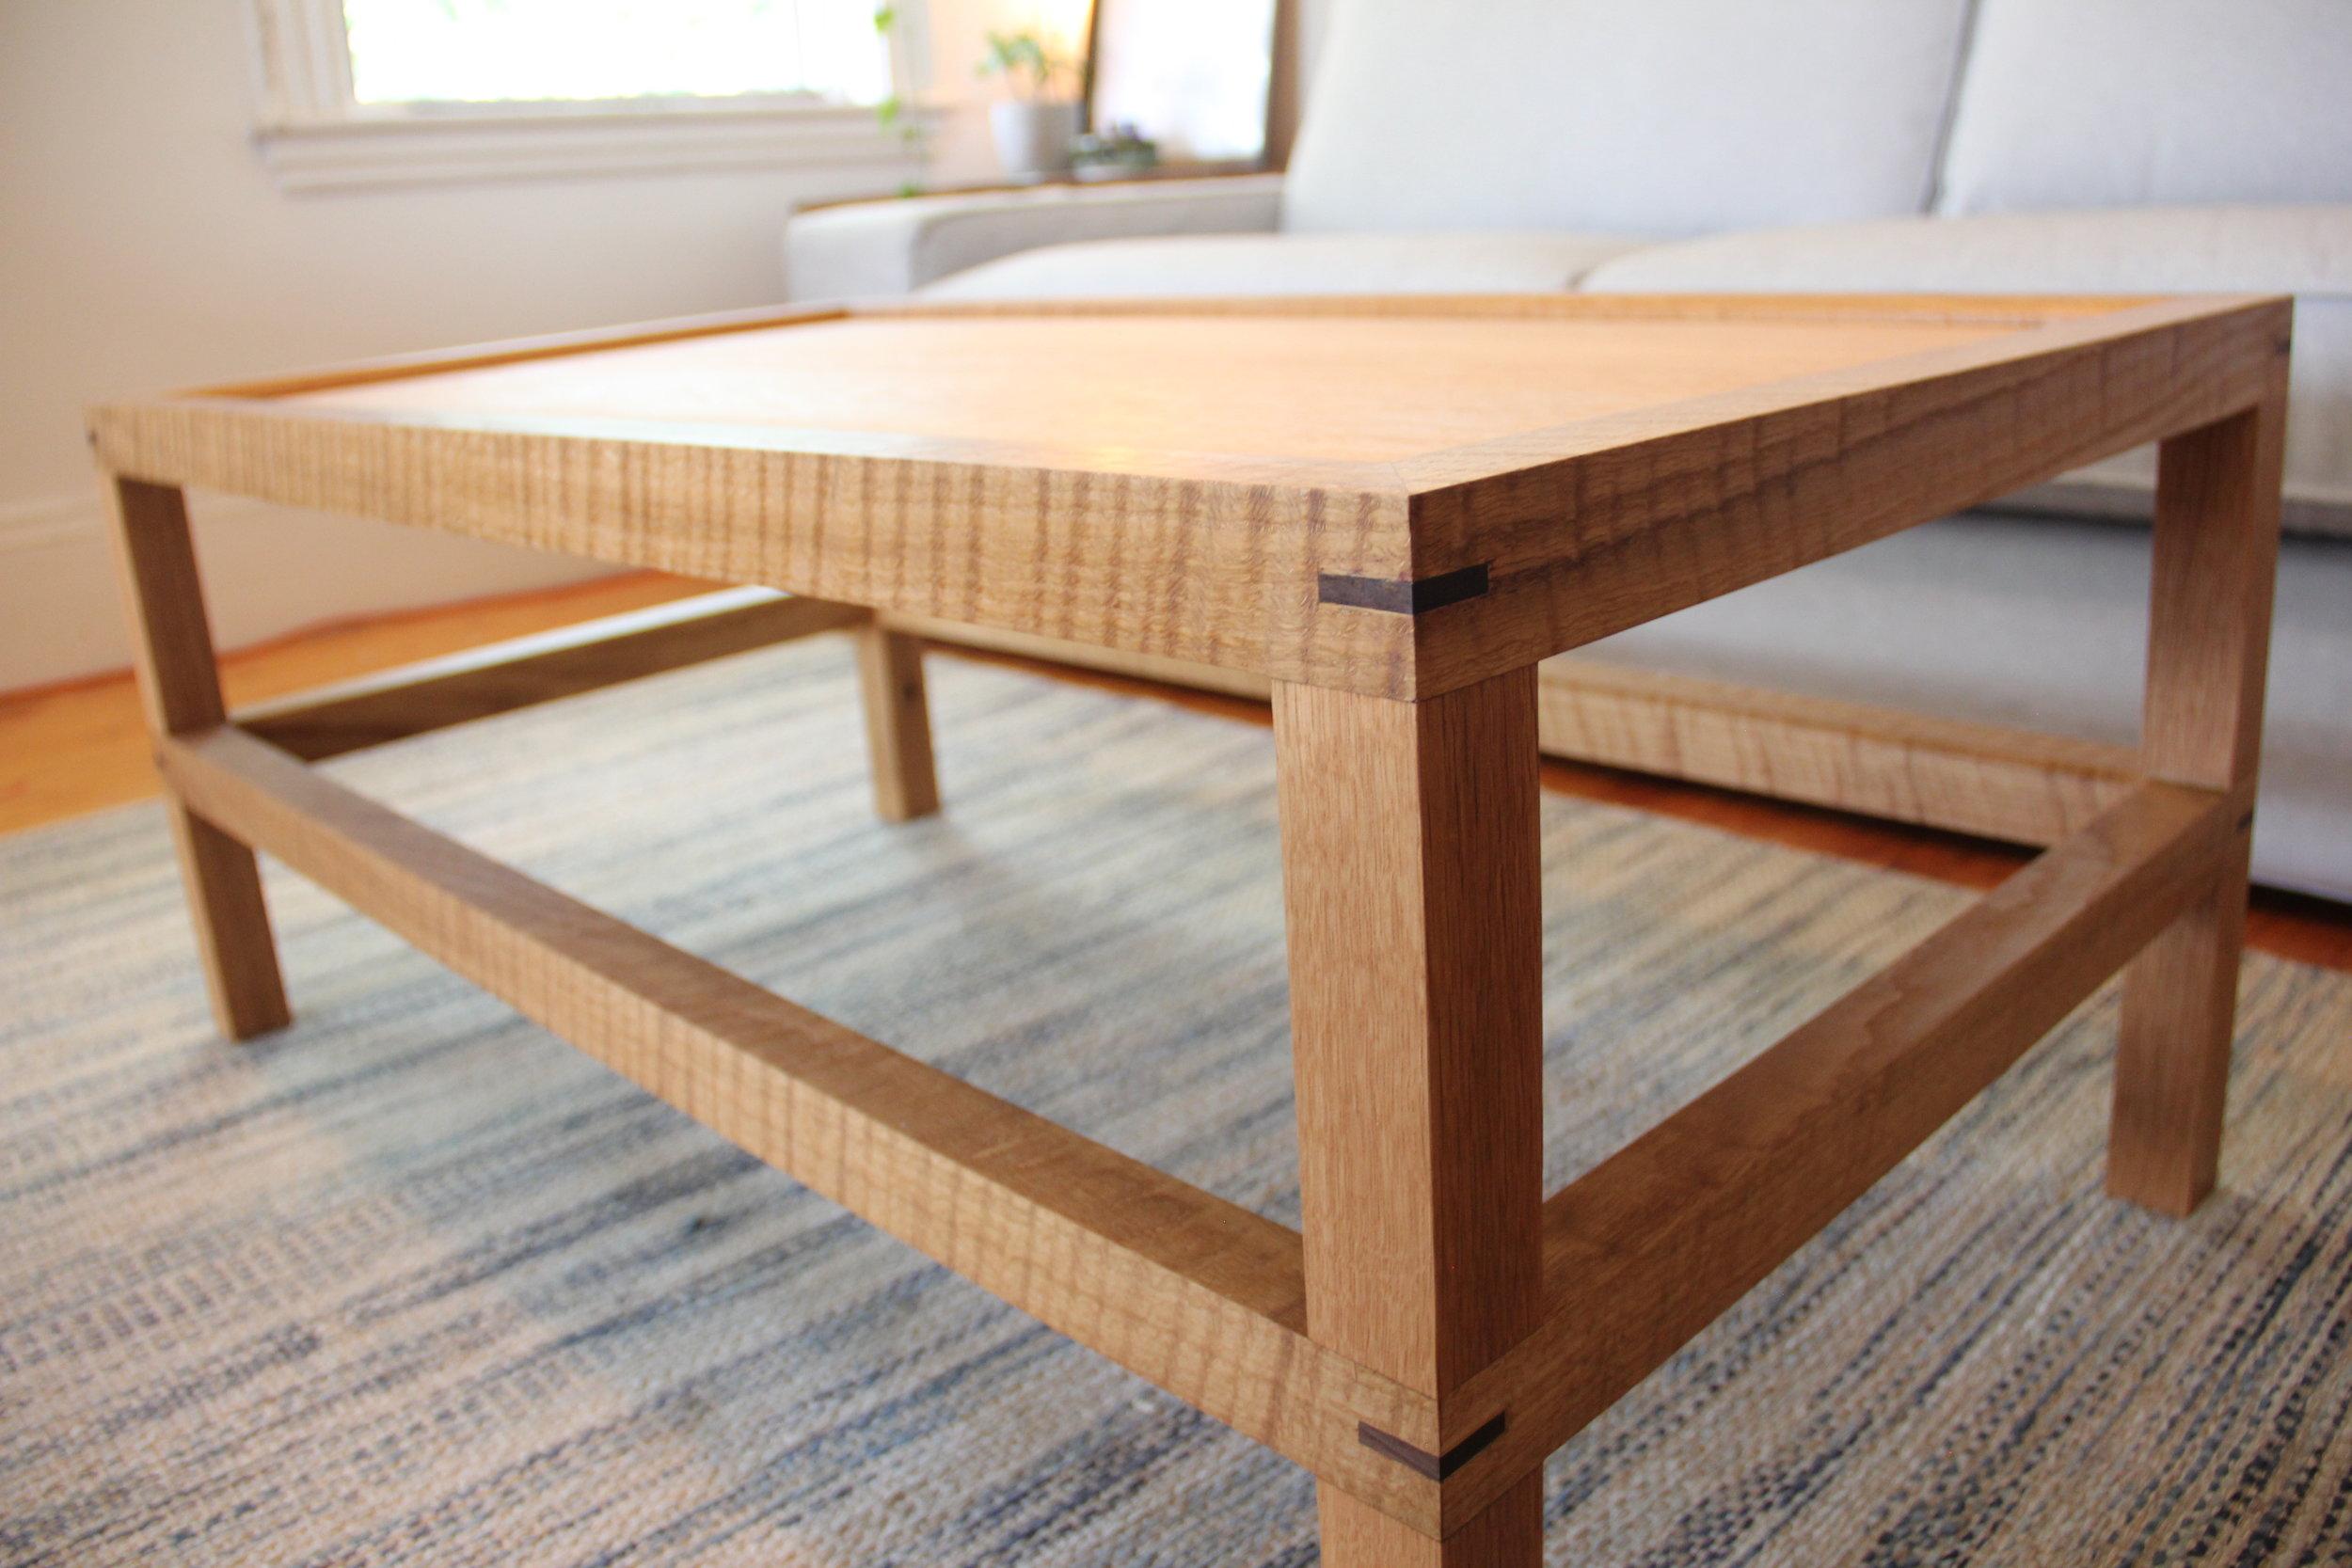 Coffee Table detail of walnut keys